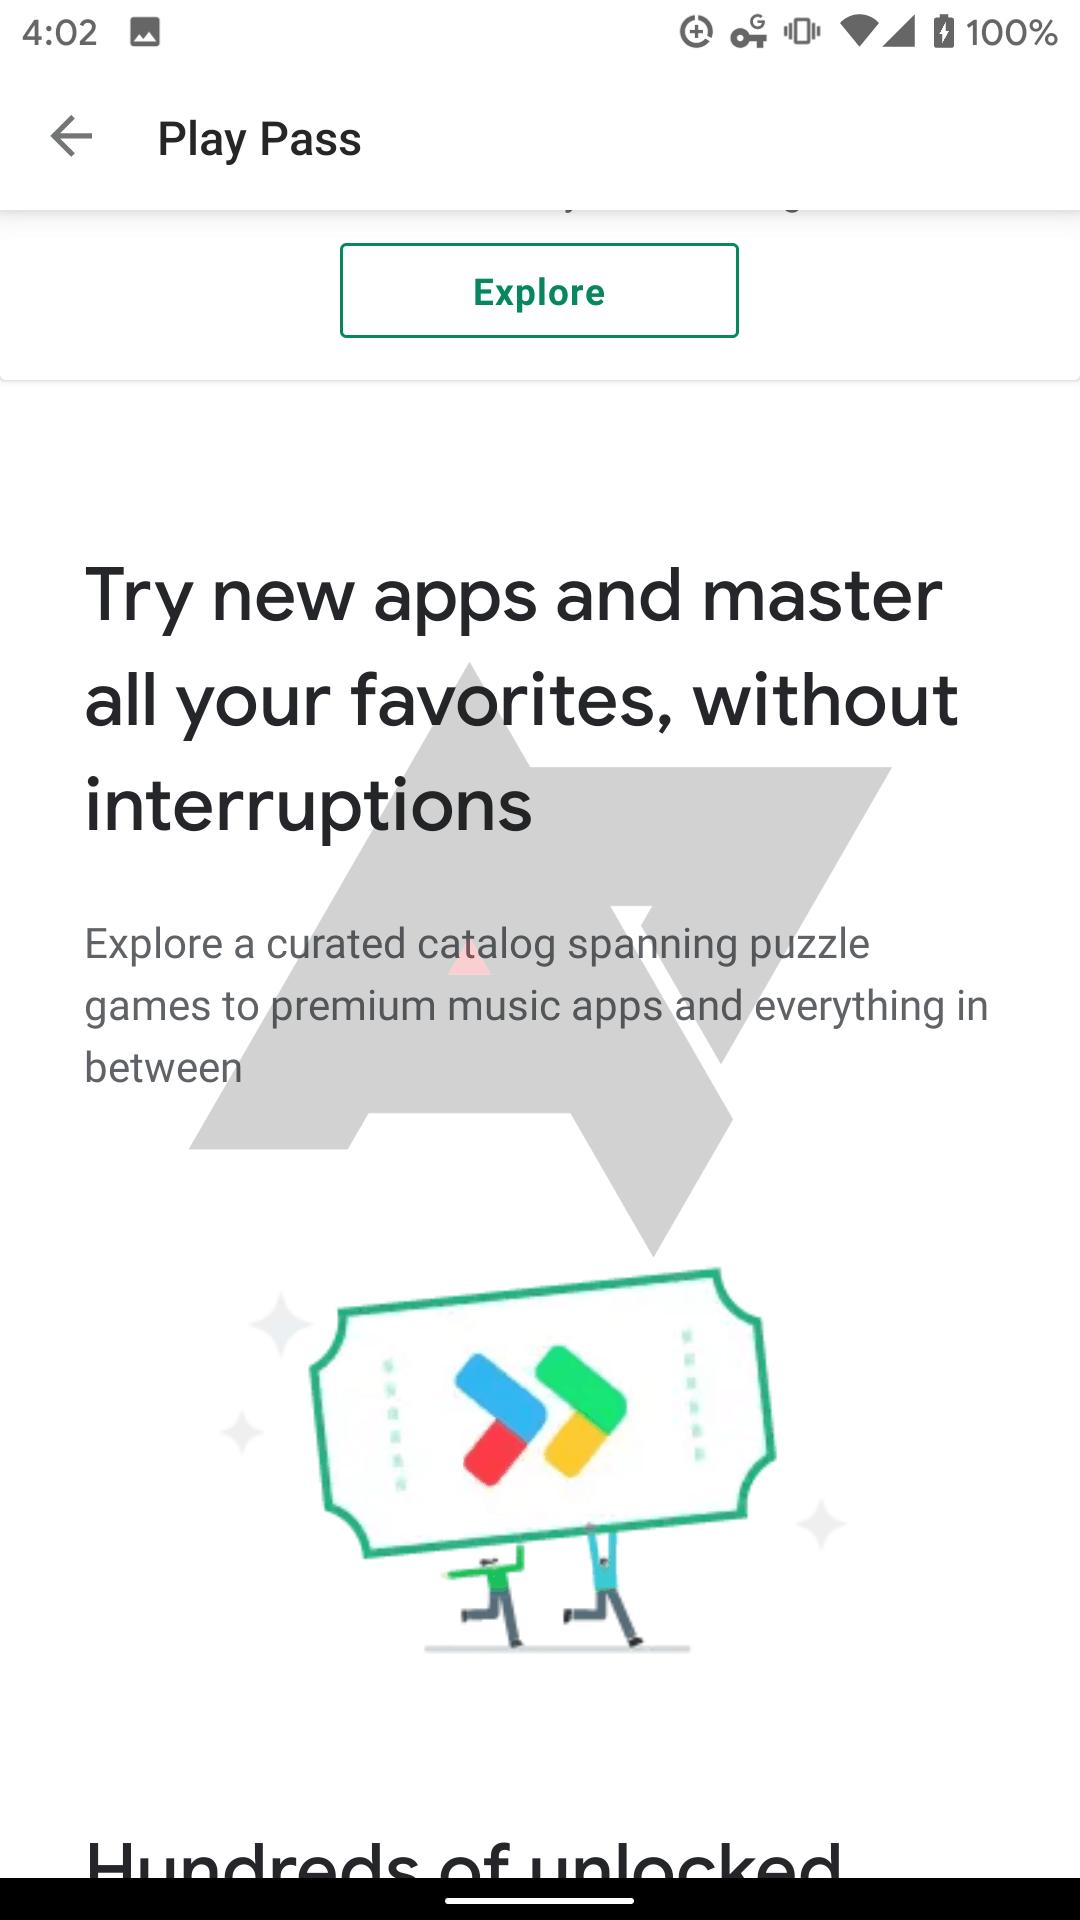 Google Play Pass 5